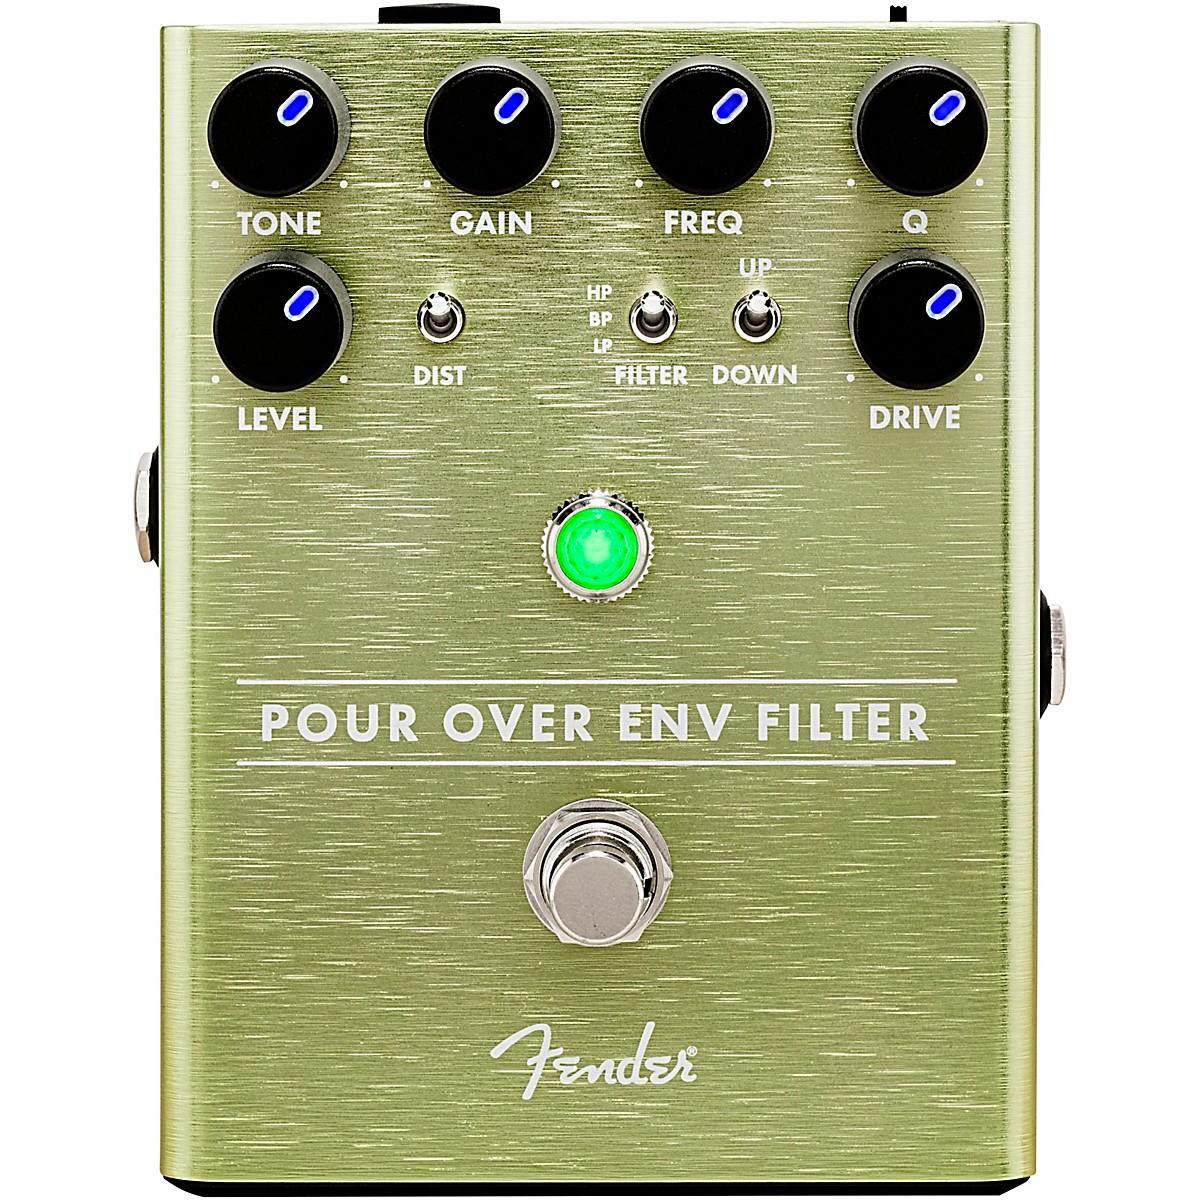 Fender Pour Over Envelope Filter Effects Pedal